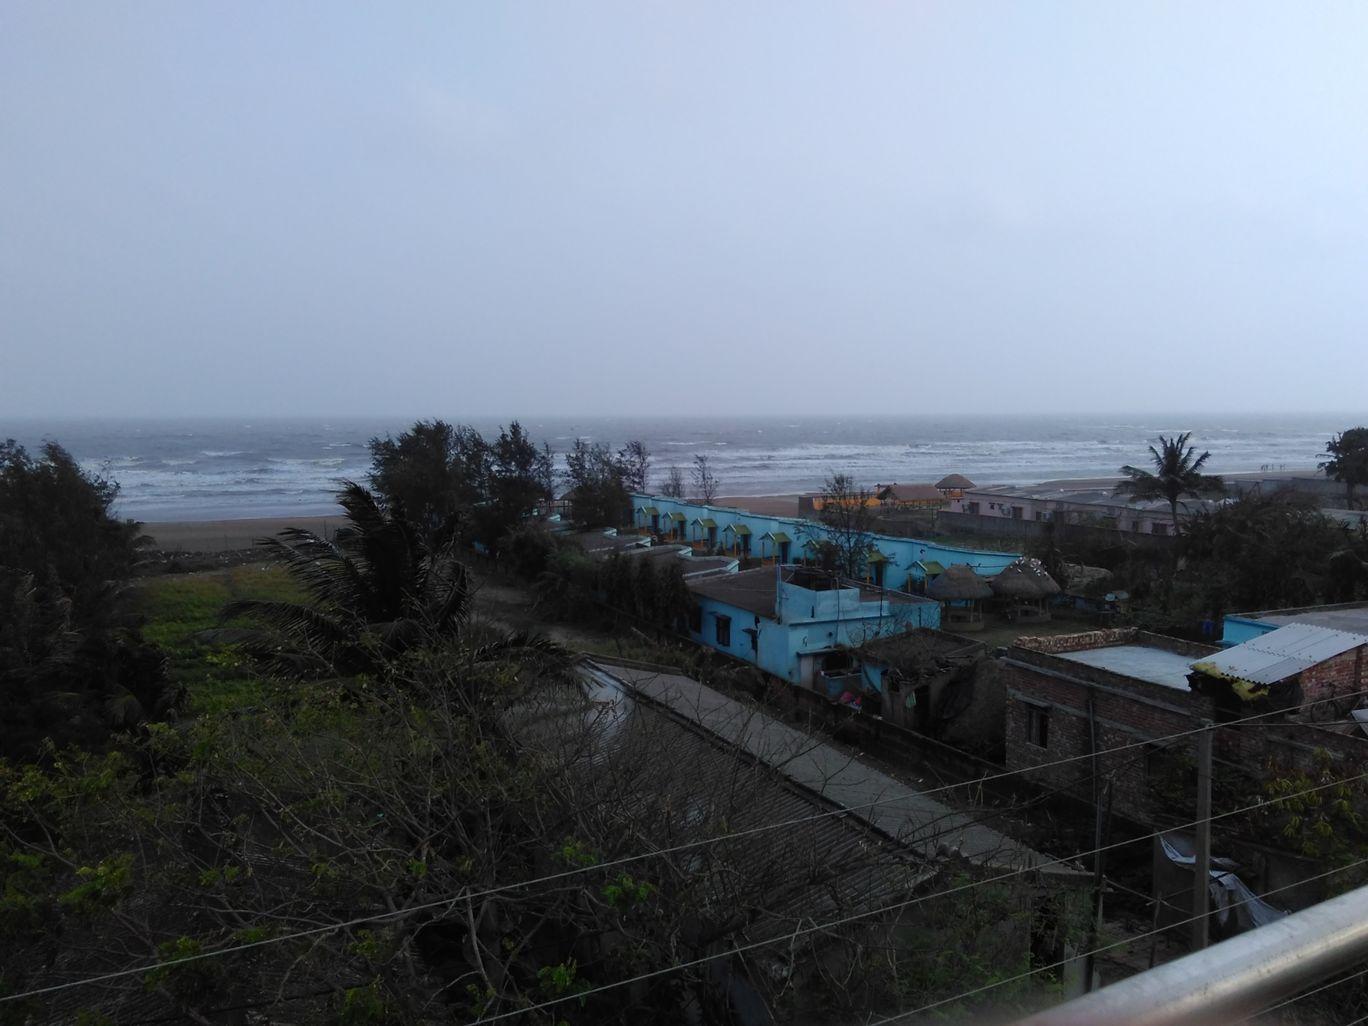 Photo of Mandarmani Beach Rd By Amir Sohail